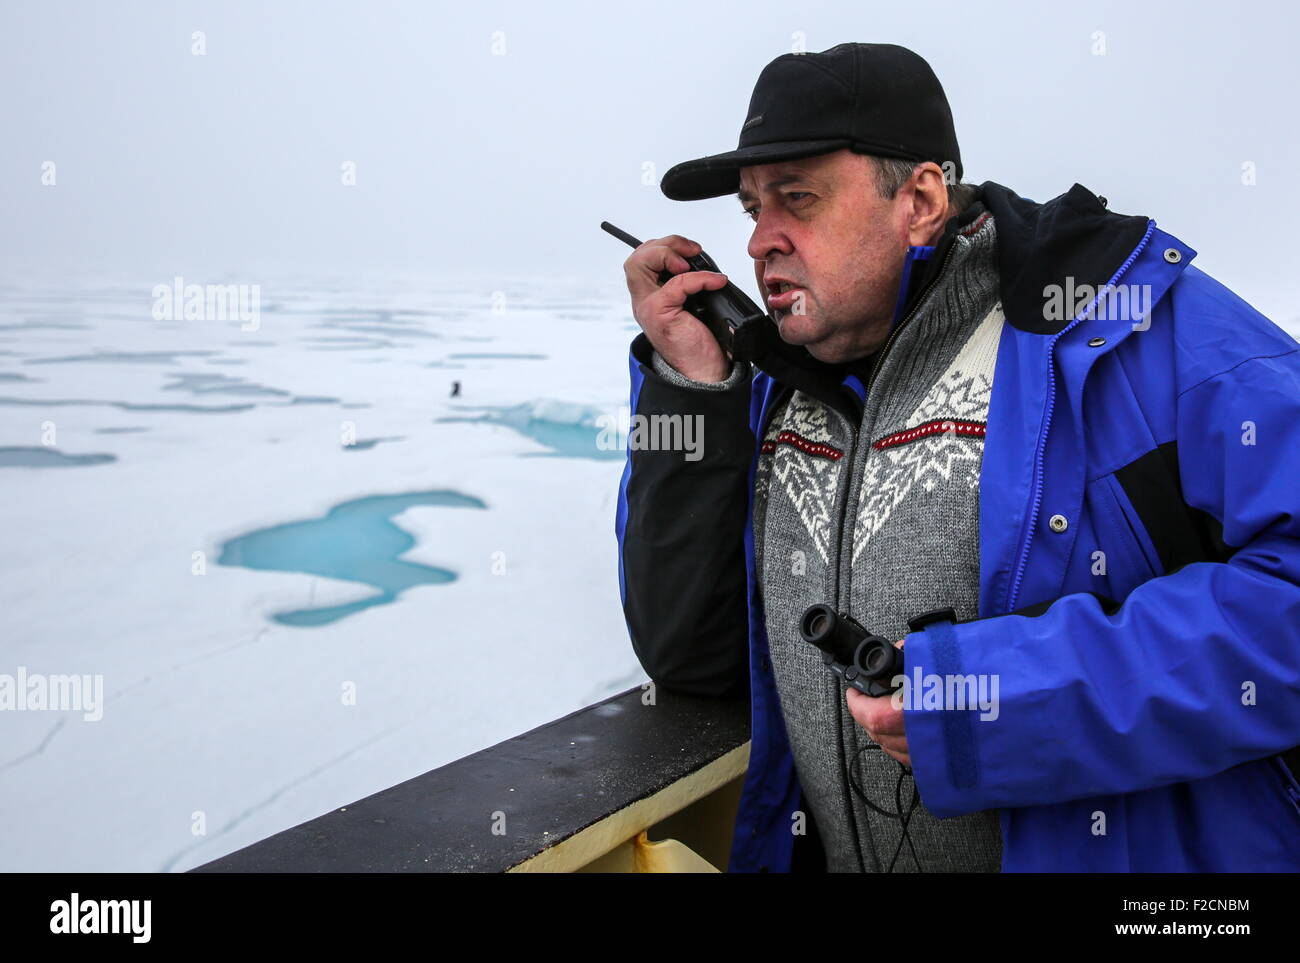 Alexander Orlov Stock Photos & Alexander Orlov Stock Images - Alamy